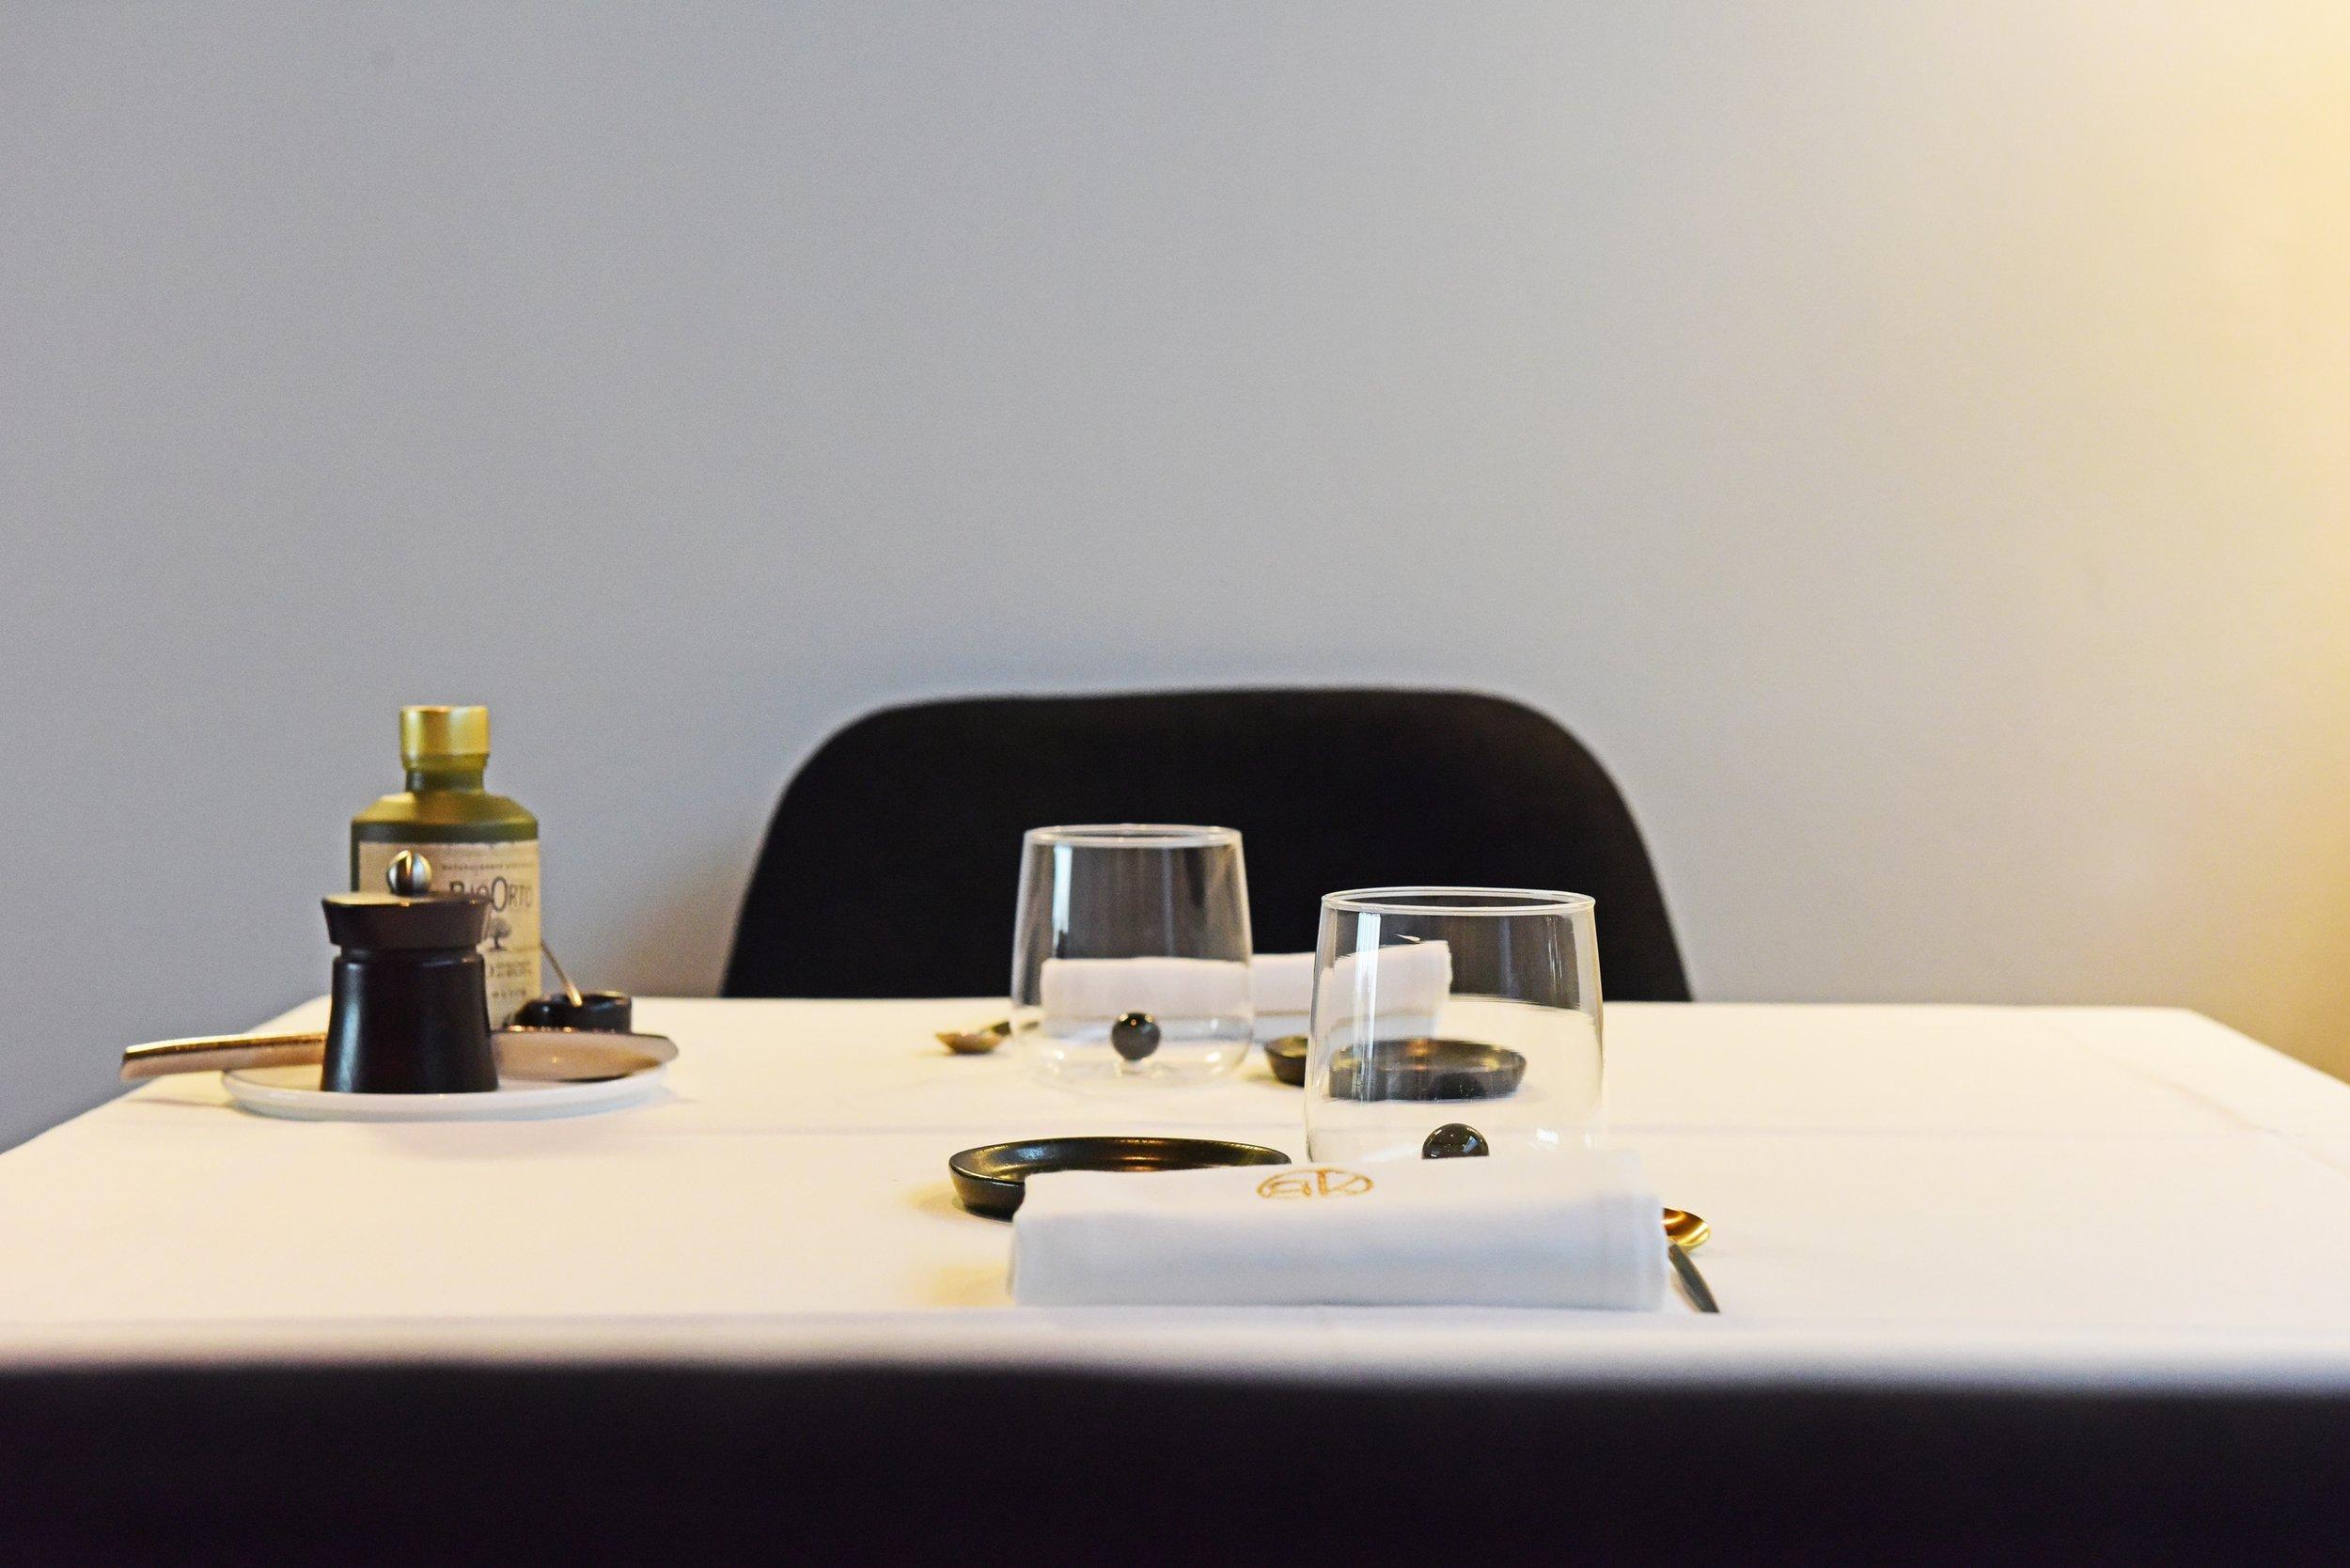 24 restaurant de bakermat ninove tablefever bart albrecht culinair fotograaf.jpg